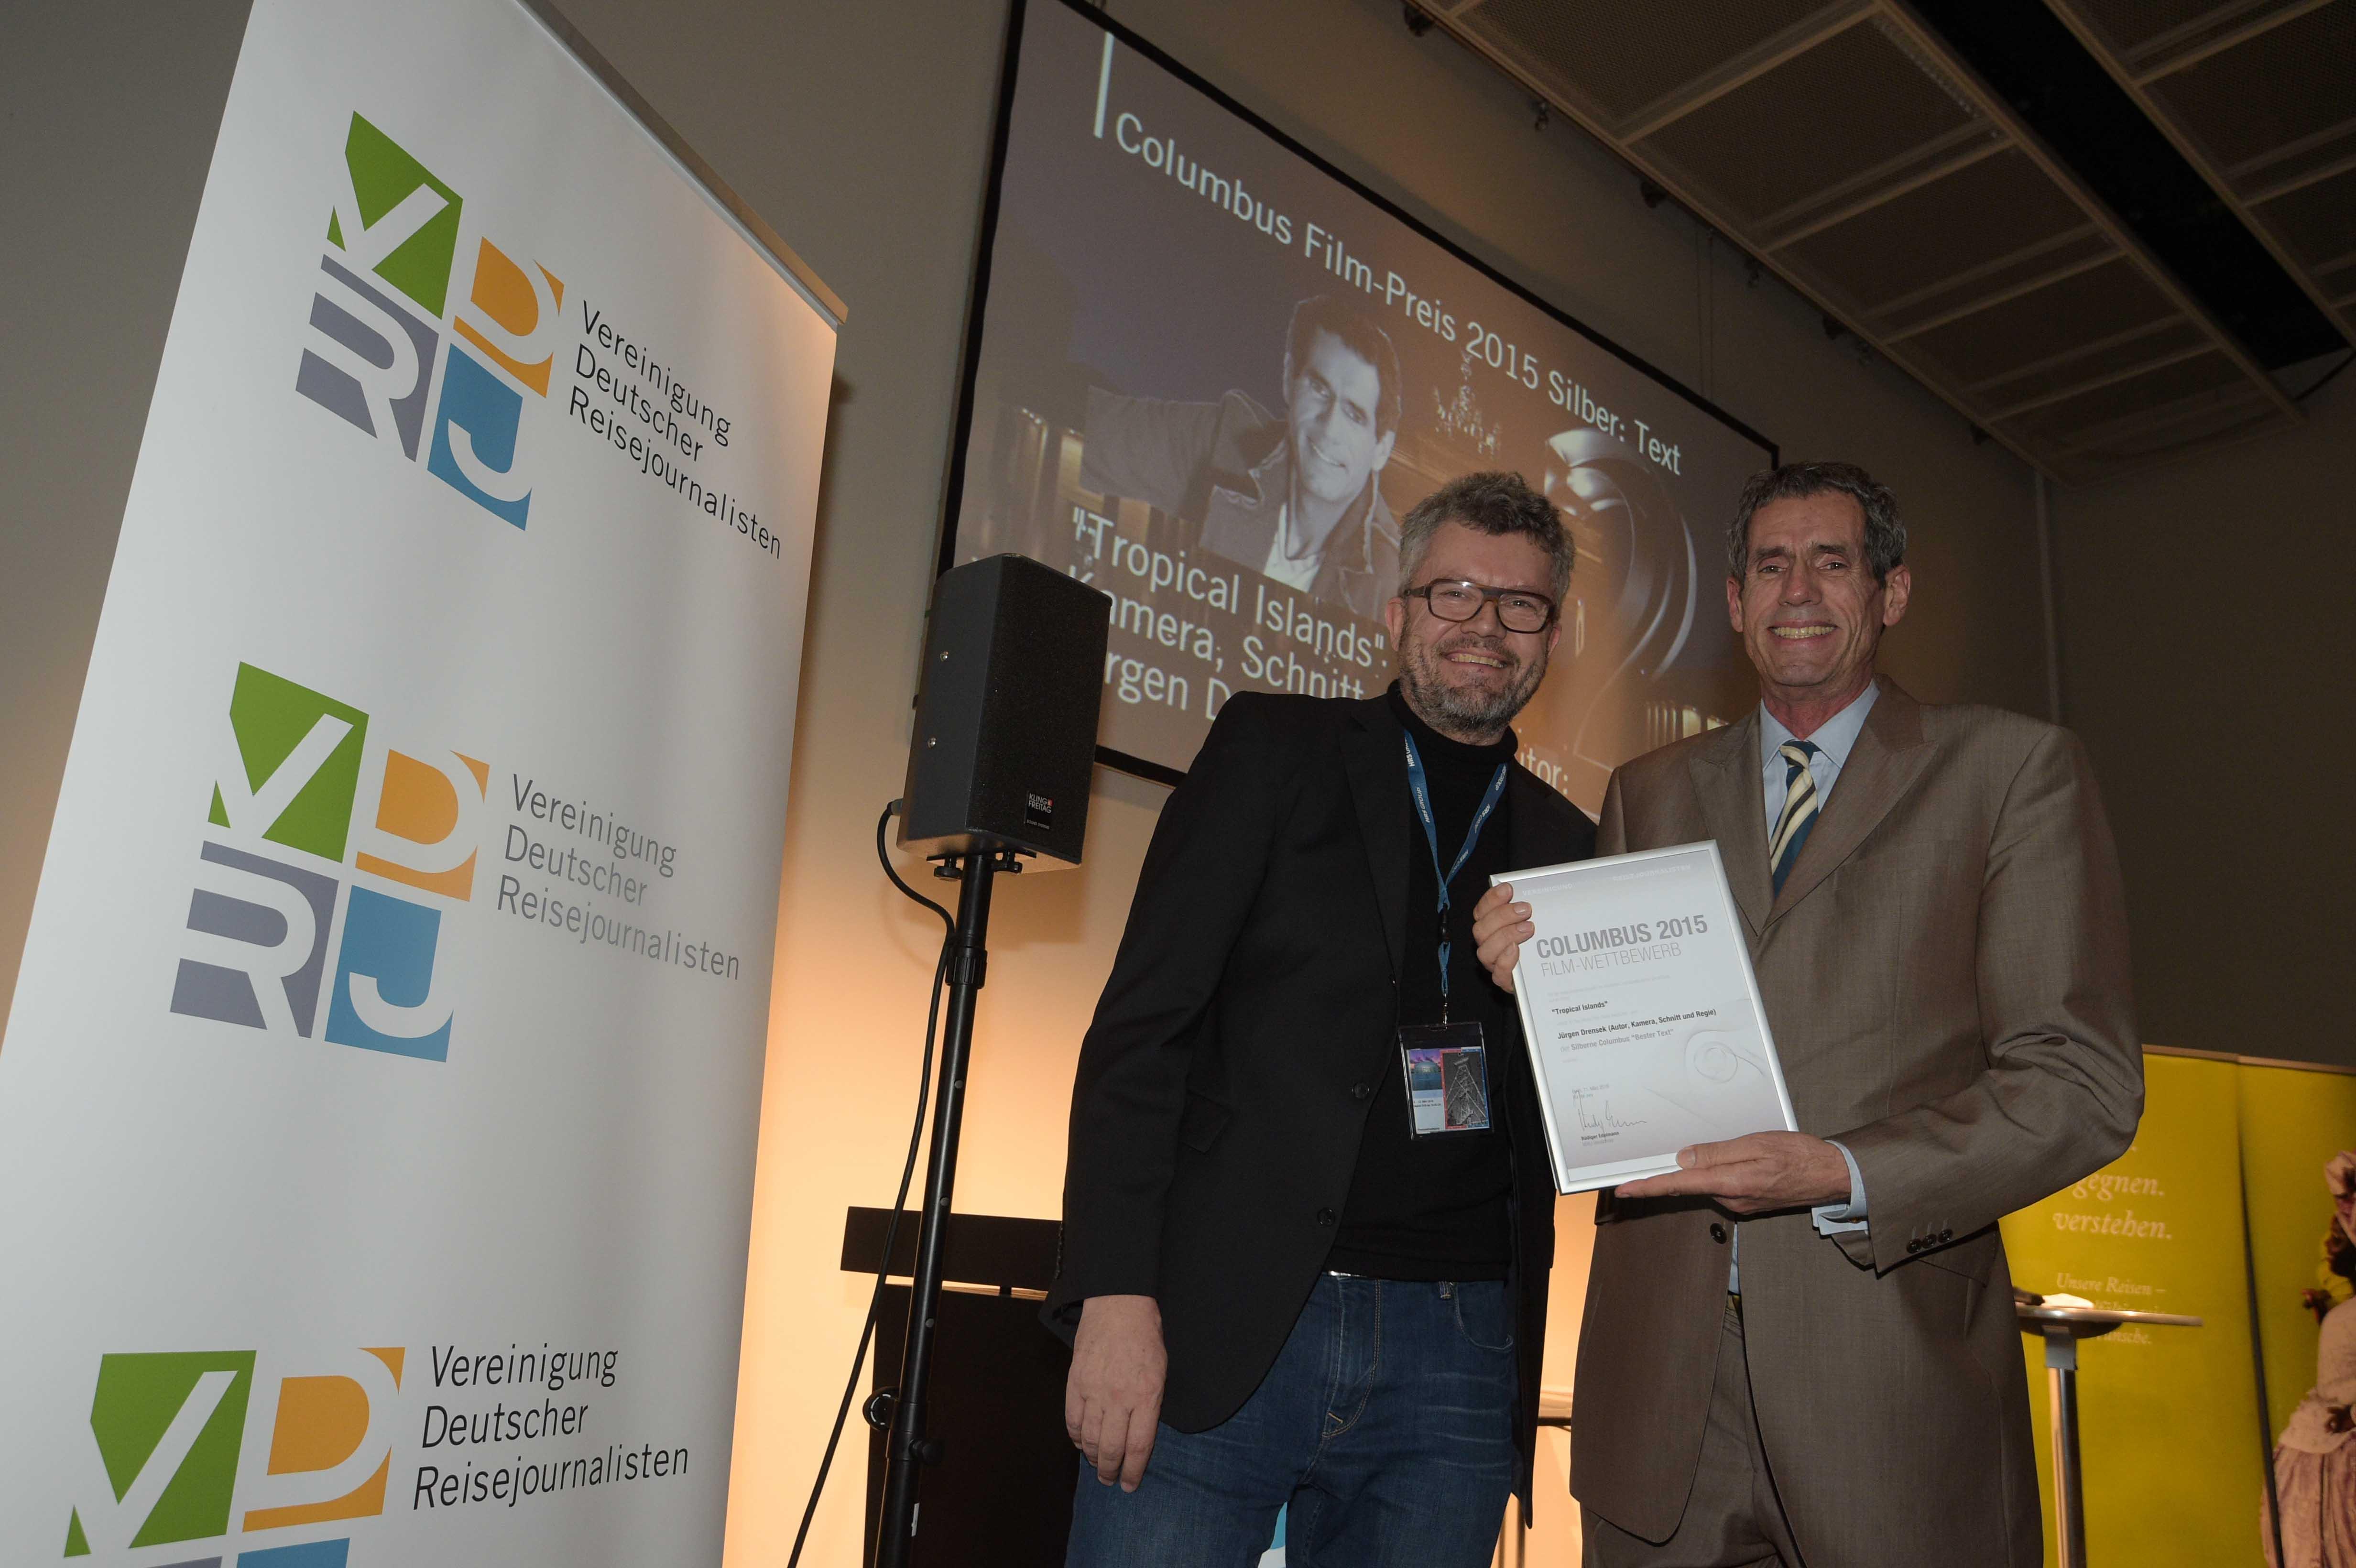 Columbus Filmpreis  2015 Silber Juergen Drensek Thomas Radler web